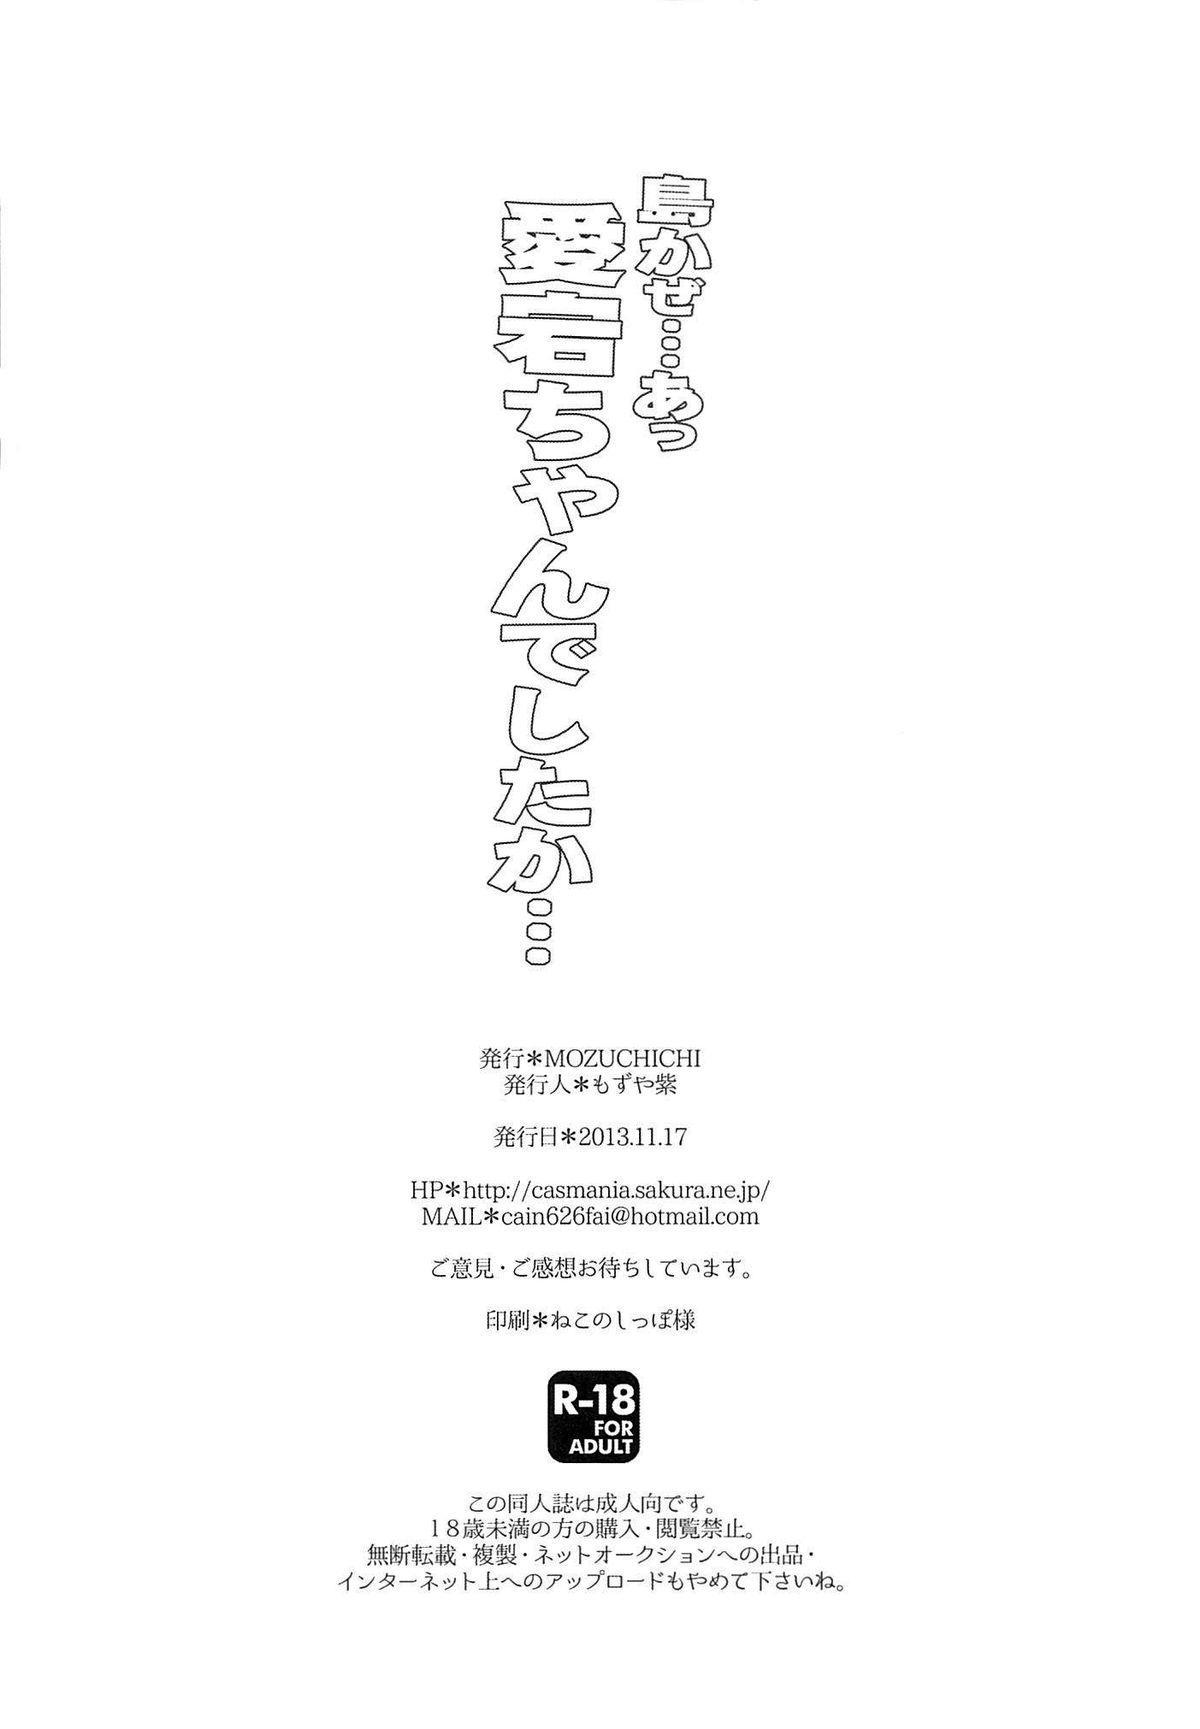 (Houraigekisen! Yo-i! 4Senme!) [MOZUCHICHI (Mozuya Murasaki)] Shimakaze...A, Atago-chan deshita ka...   Shimakaze... ah, Atago-chan, Were You... (Kantai Collection) [English] {doujin-moe.us} 23